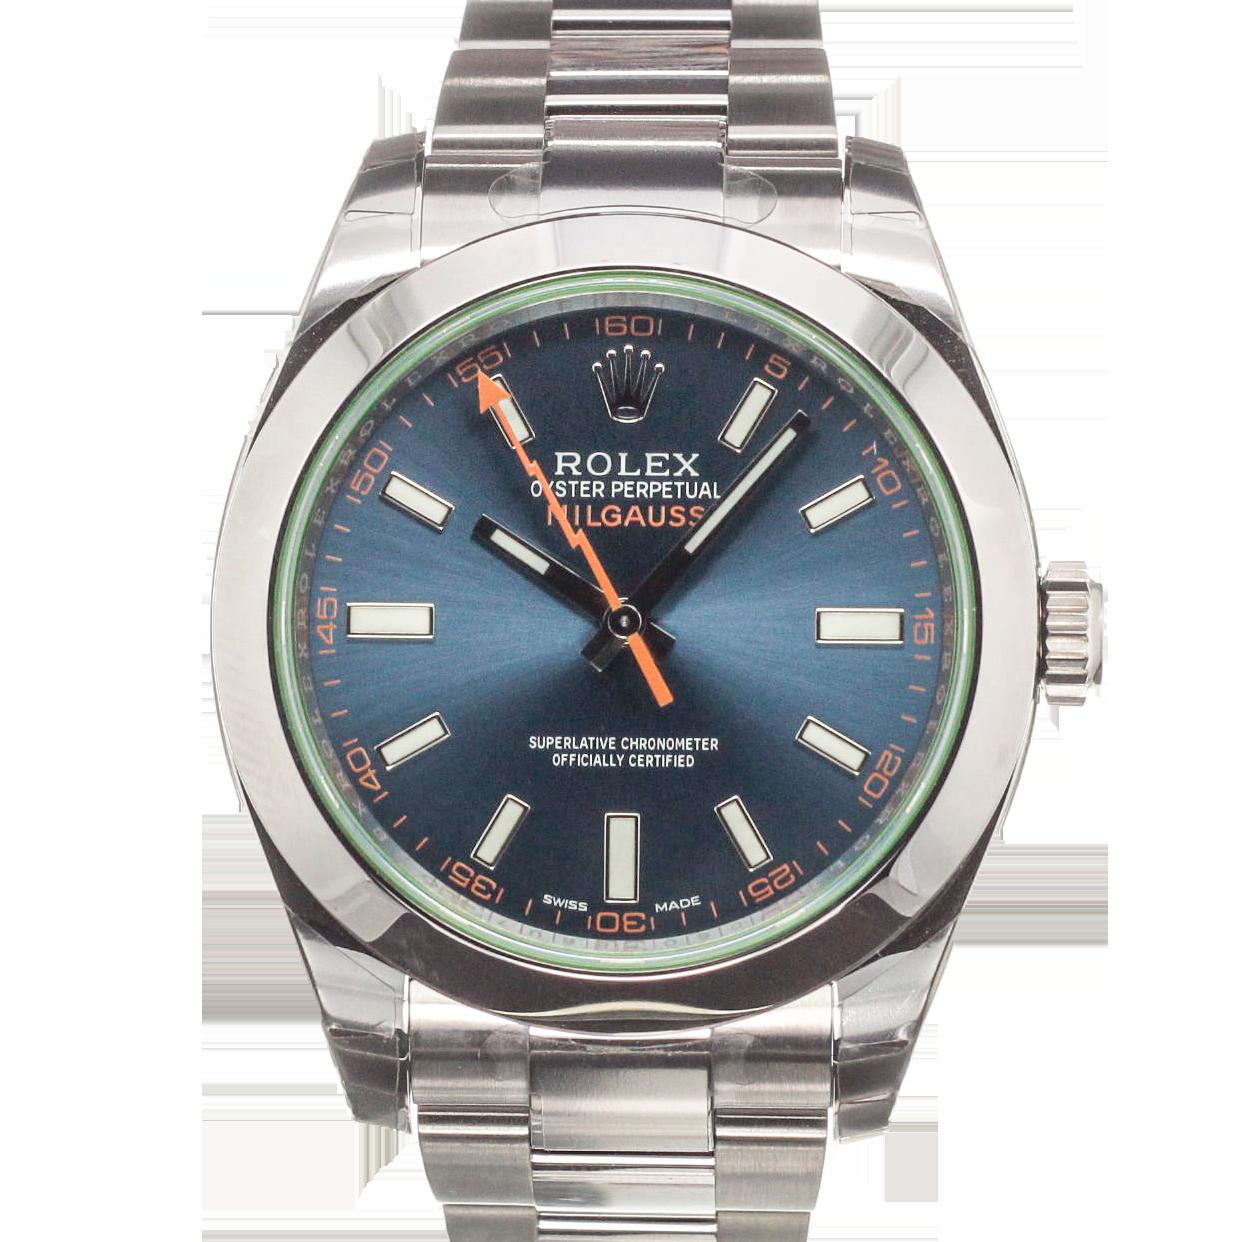 Rolex milgauss infos price history chronext for Rolex milgauss